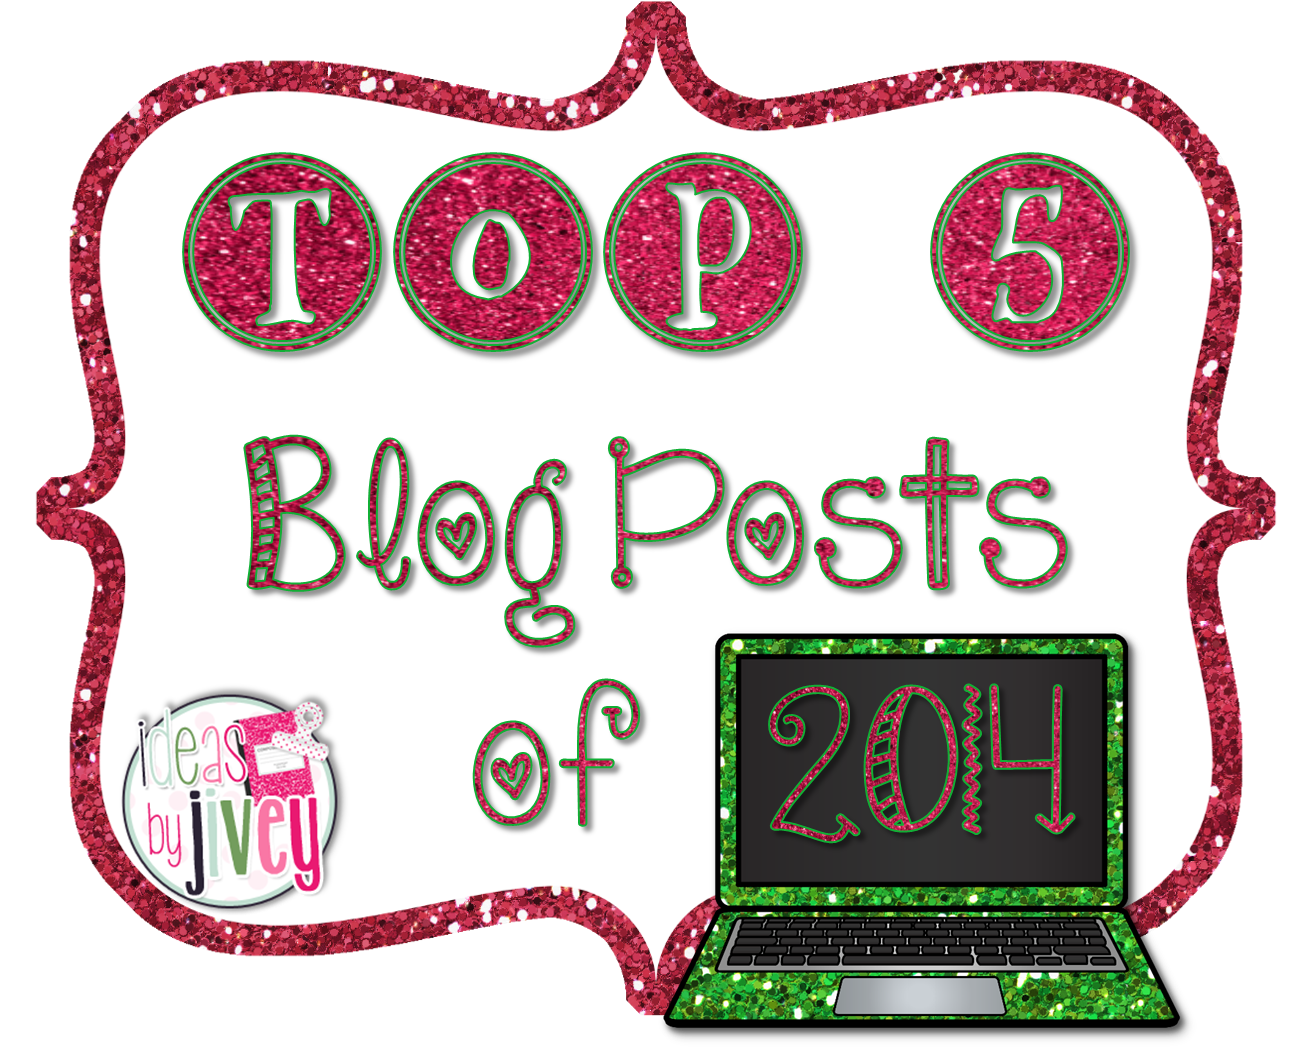 http://ideasbyjivey.blogspot.com/2014/12/top-5-blog-posts-of-2014.html